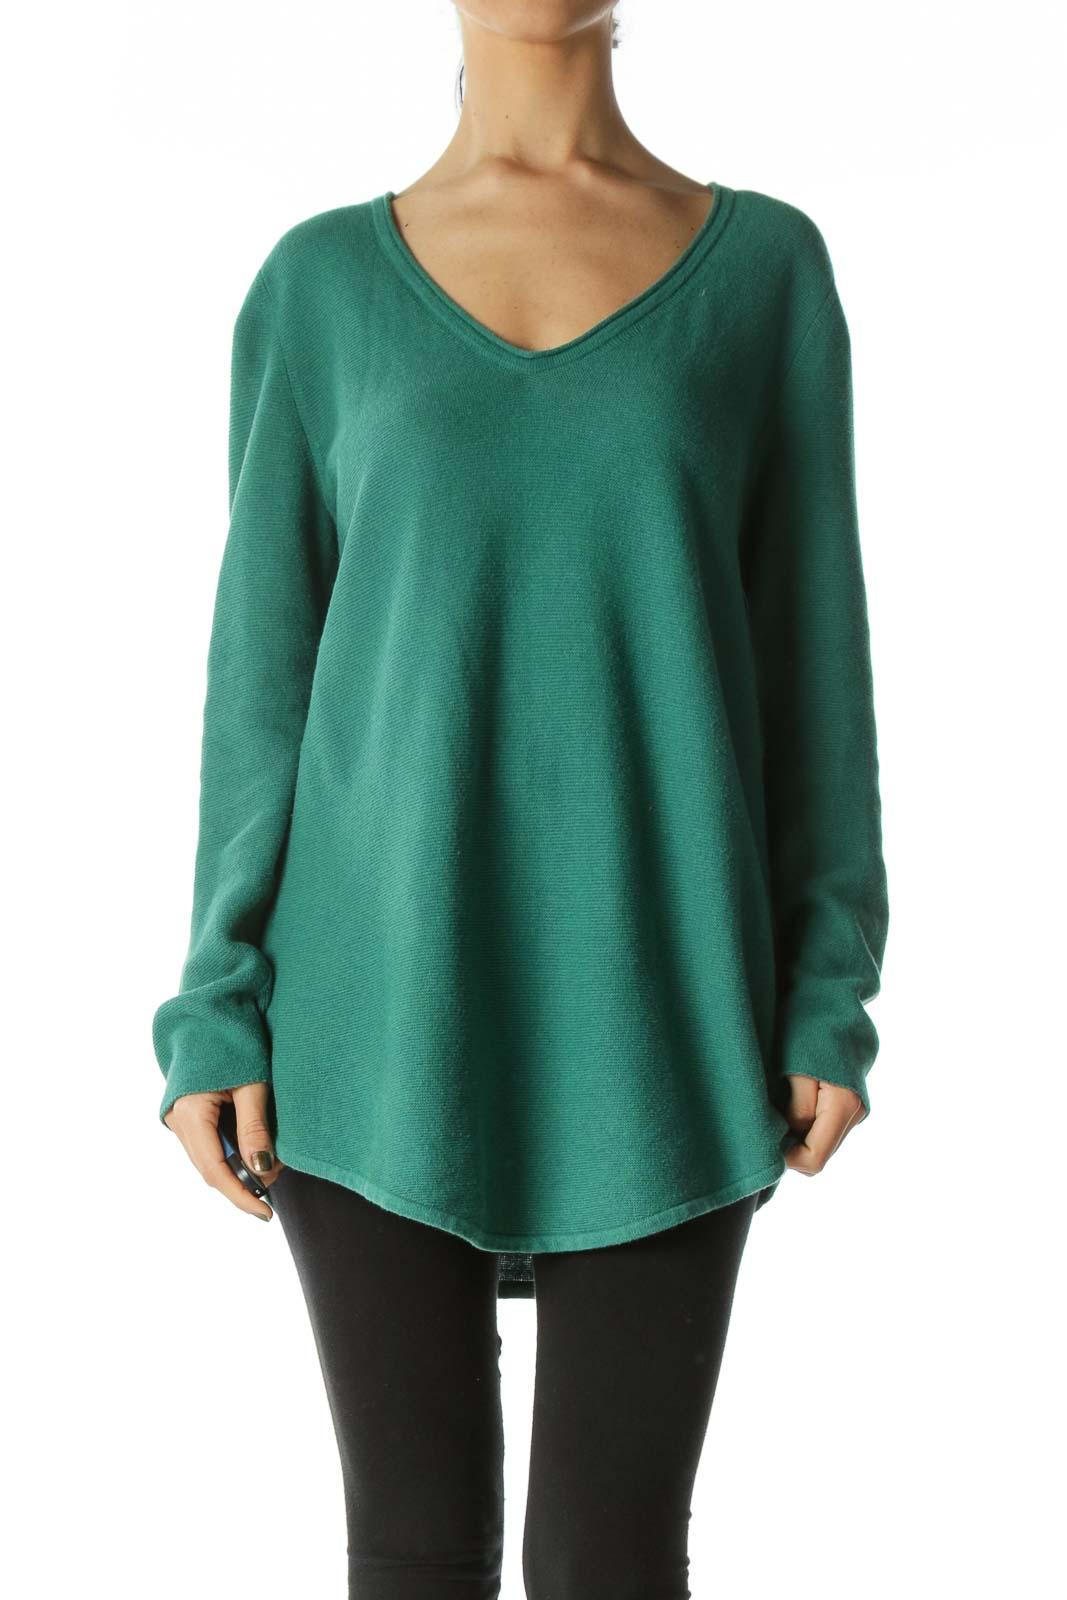 Green Long-Sleeve Knit V-Neck Top